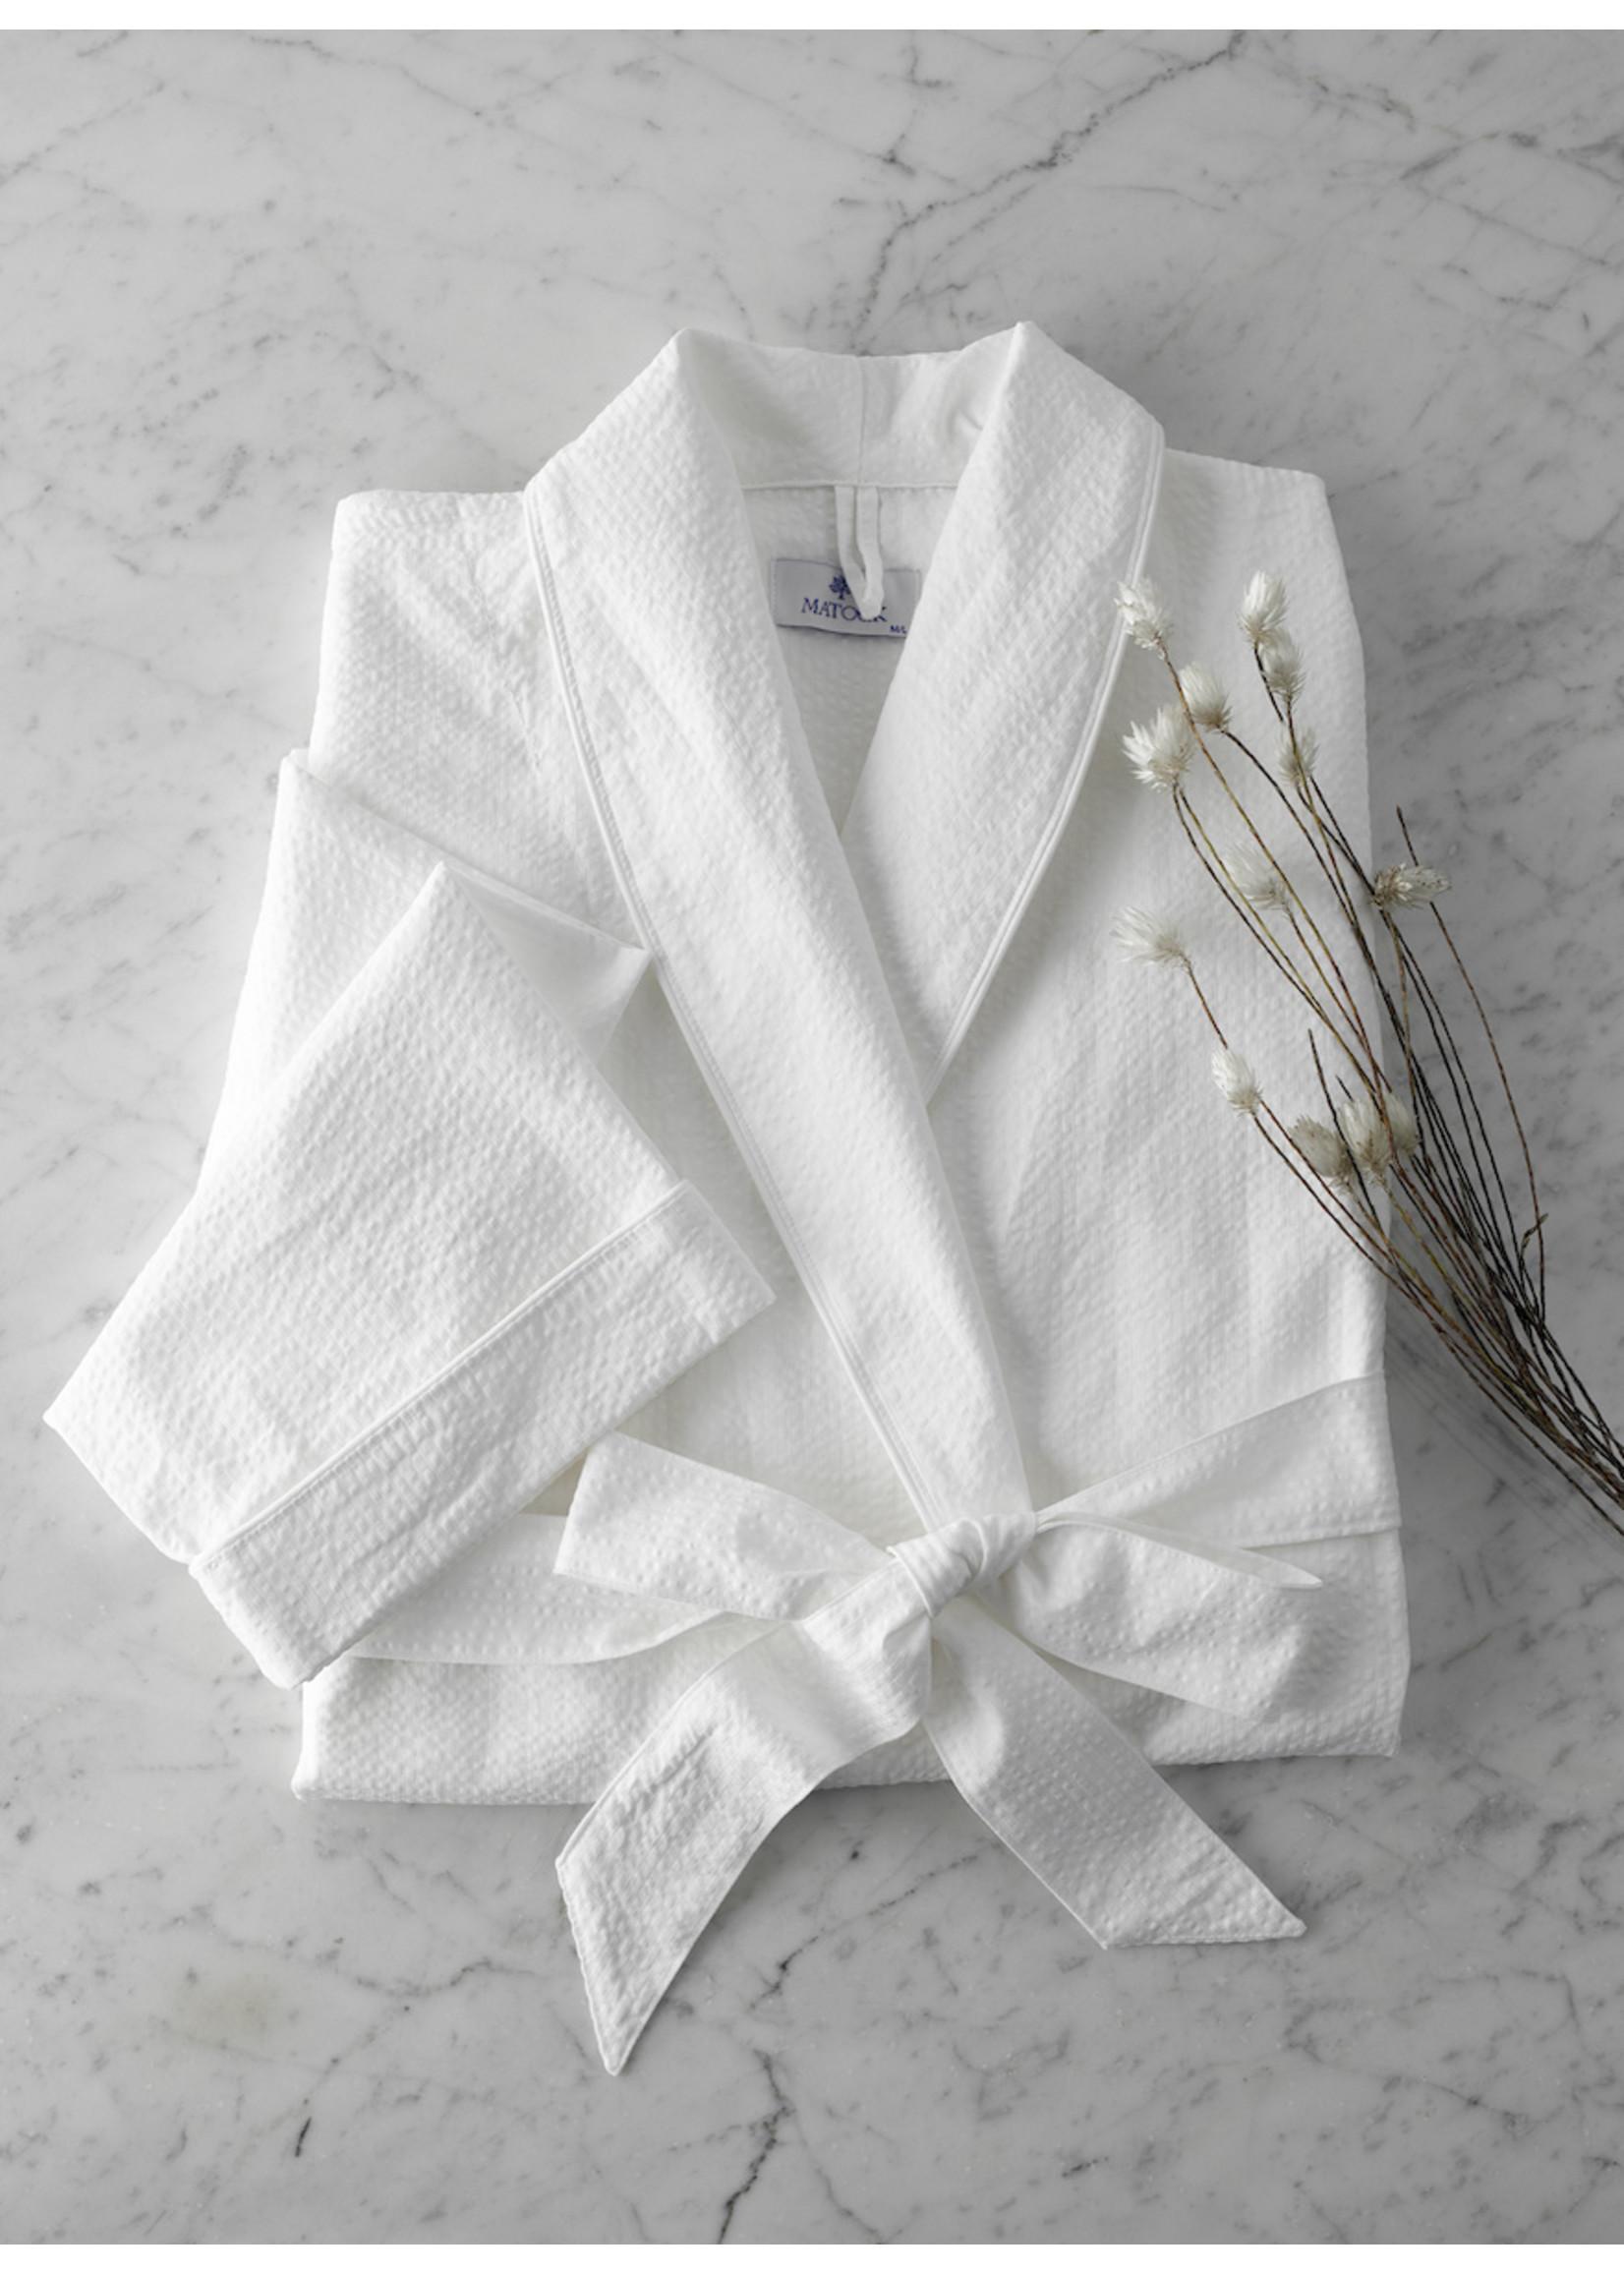 Matouk Seersucker Robe